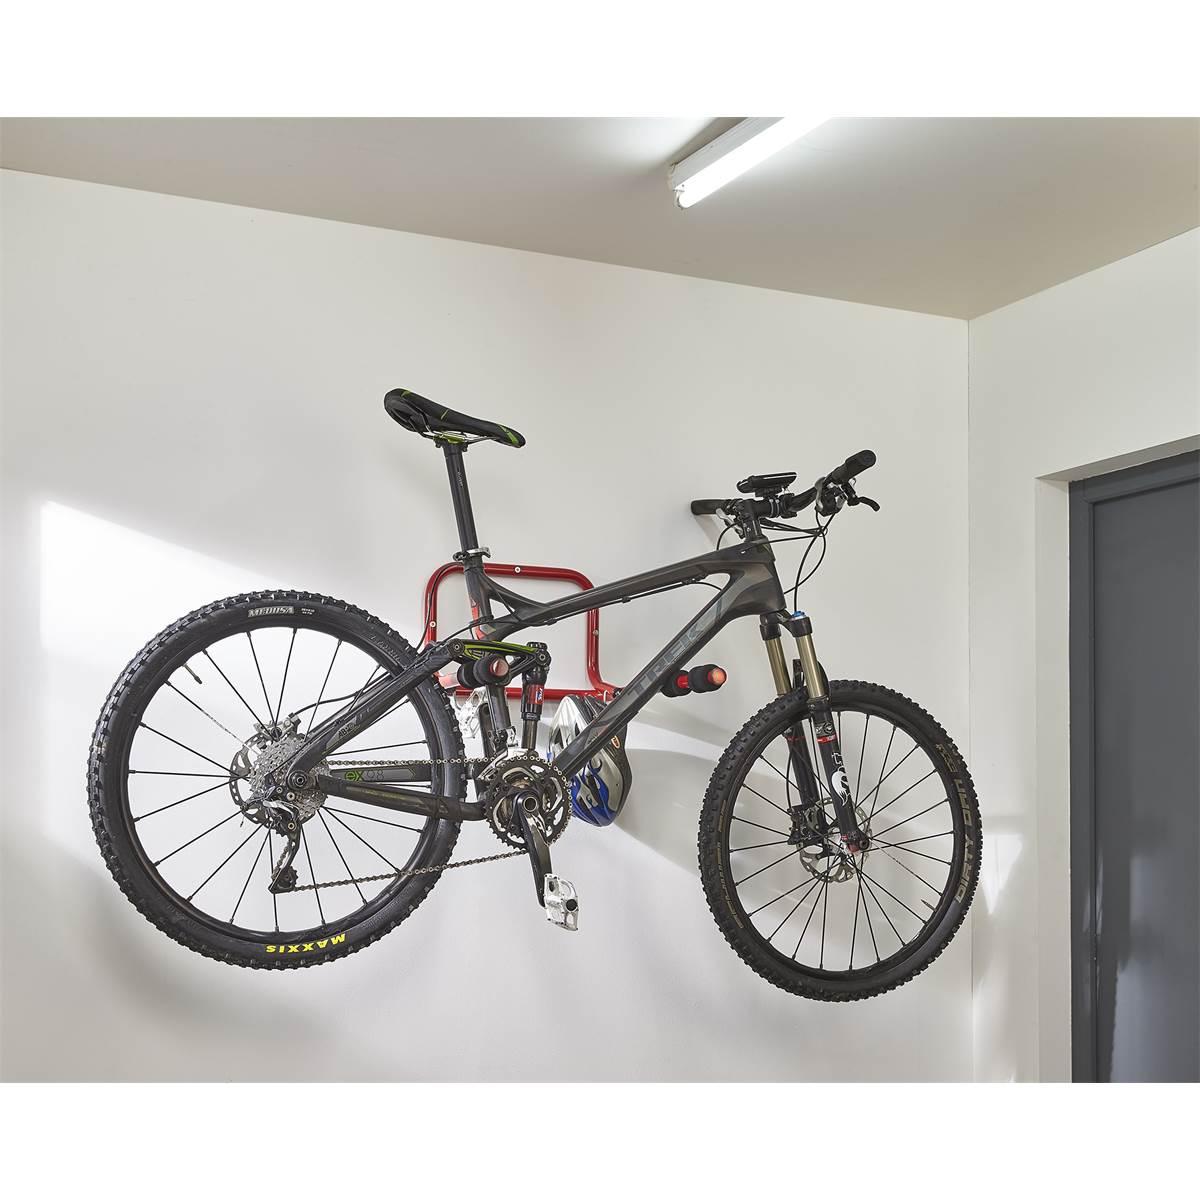 Fixation Pour Velo Garage range vélos mural